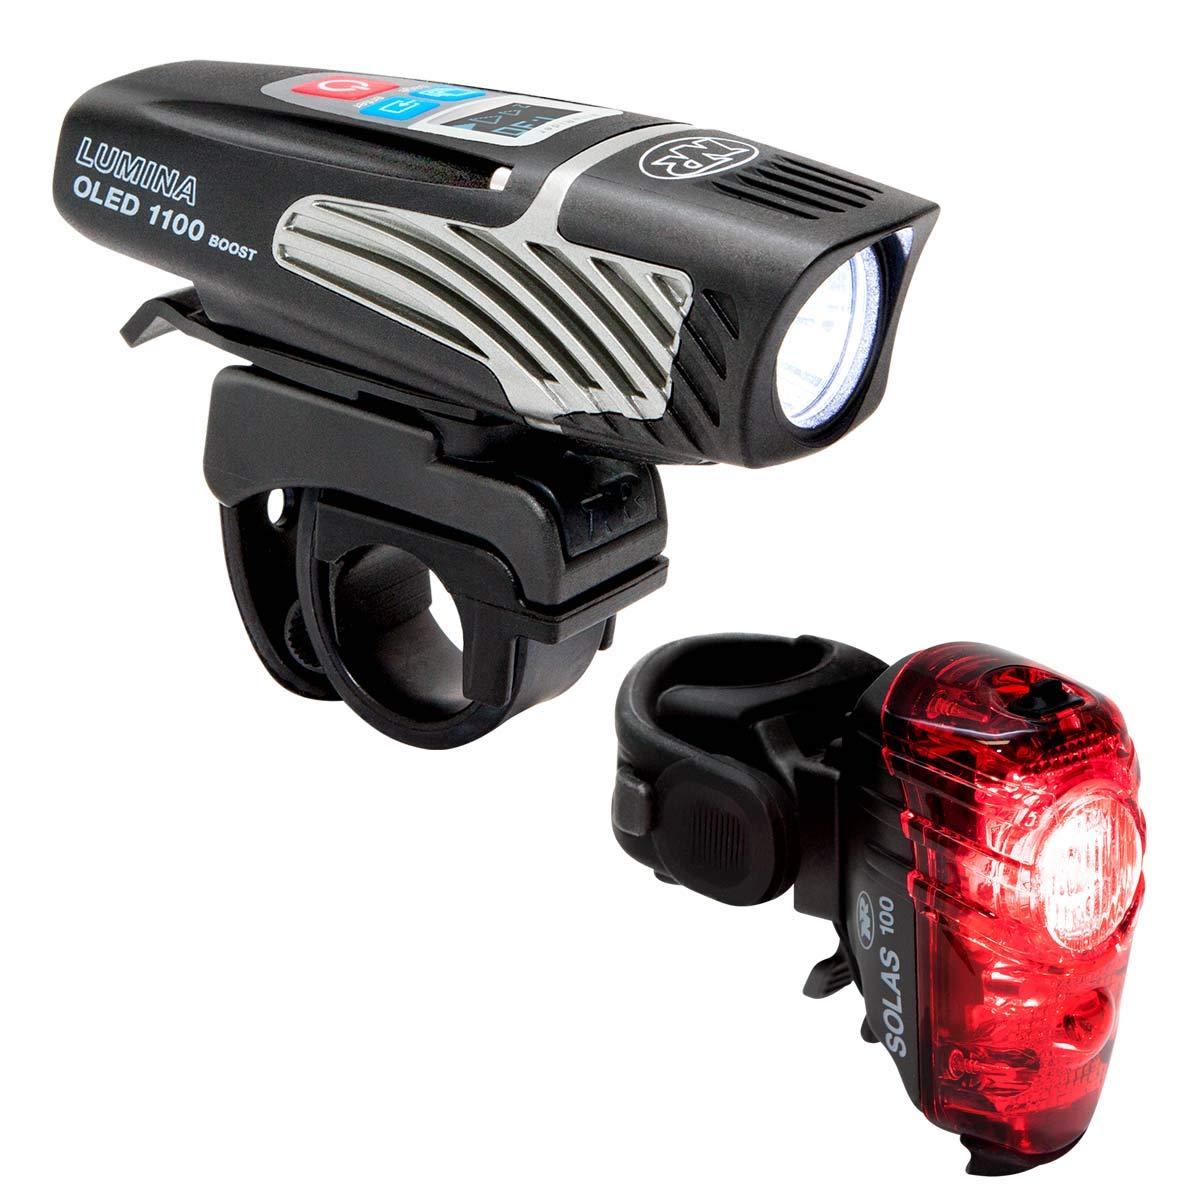 NiteRider Lumina OLED 1100 Boost Solas 100 Combo Bike Headlight Taillight